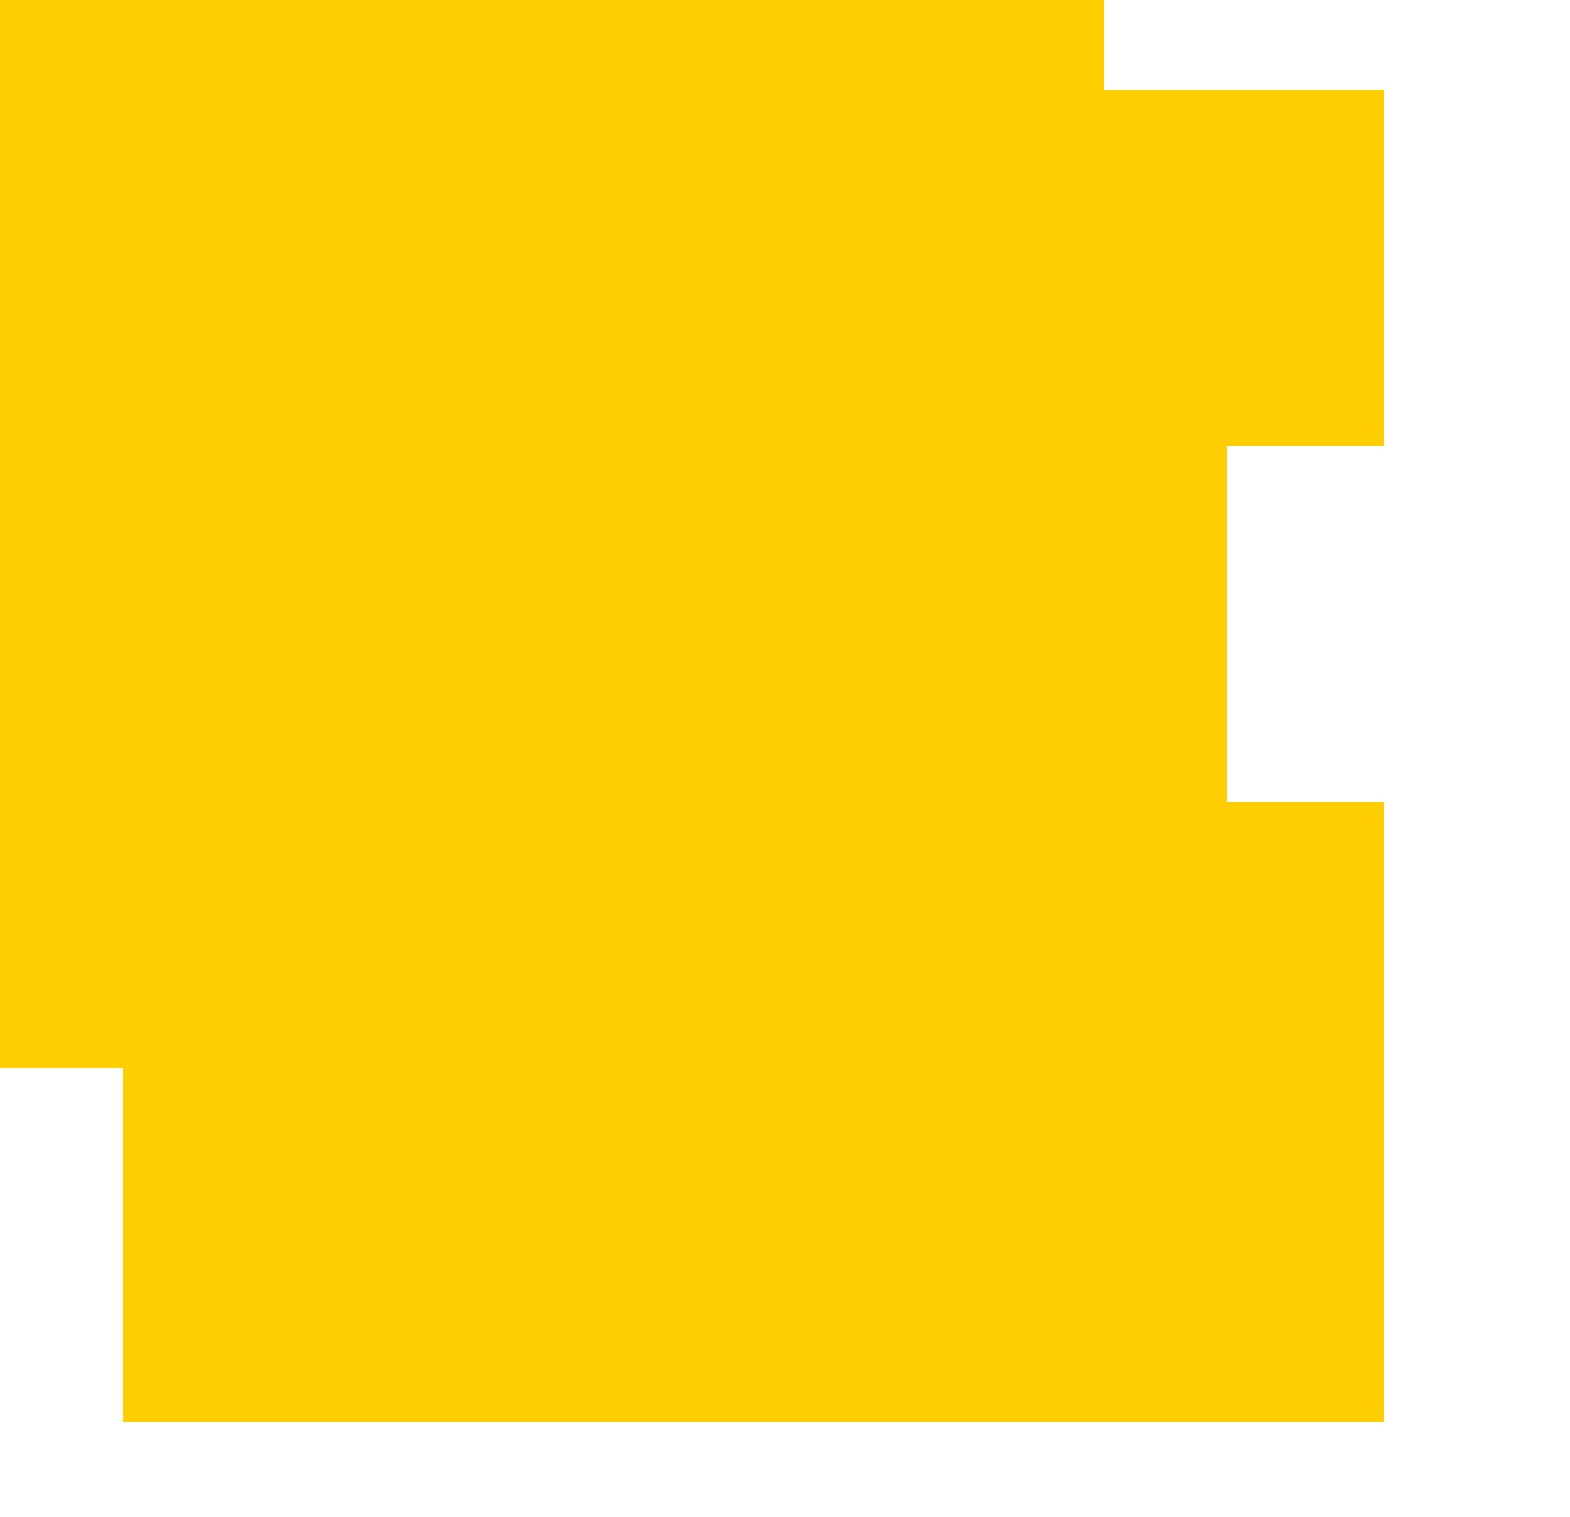 10/20